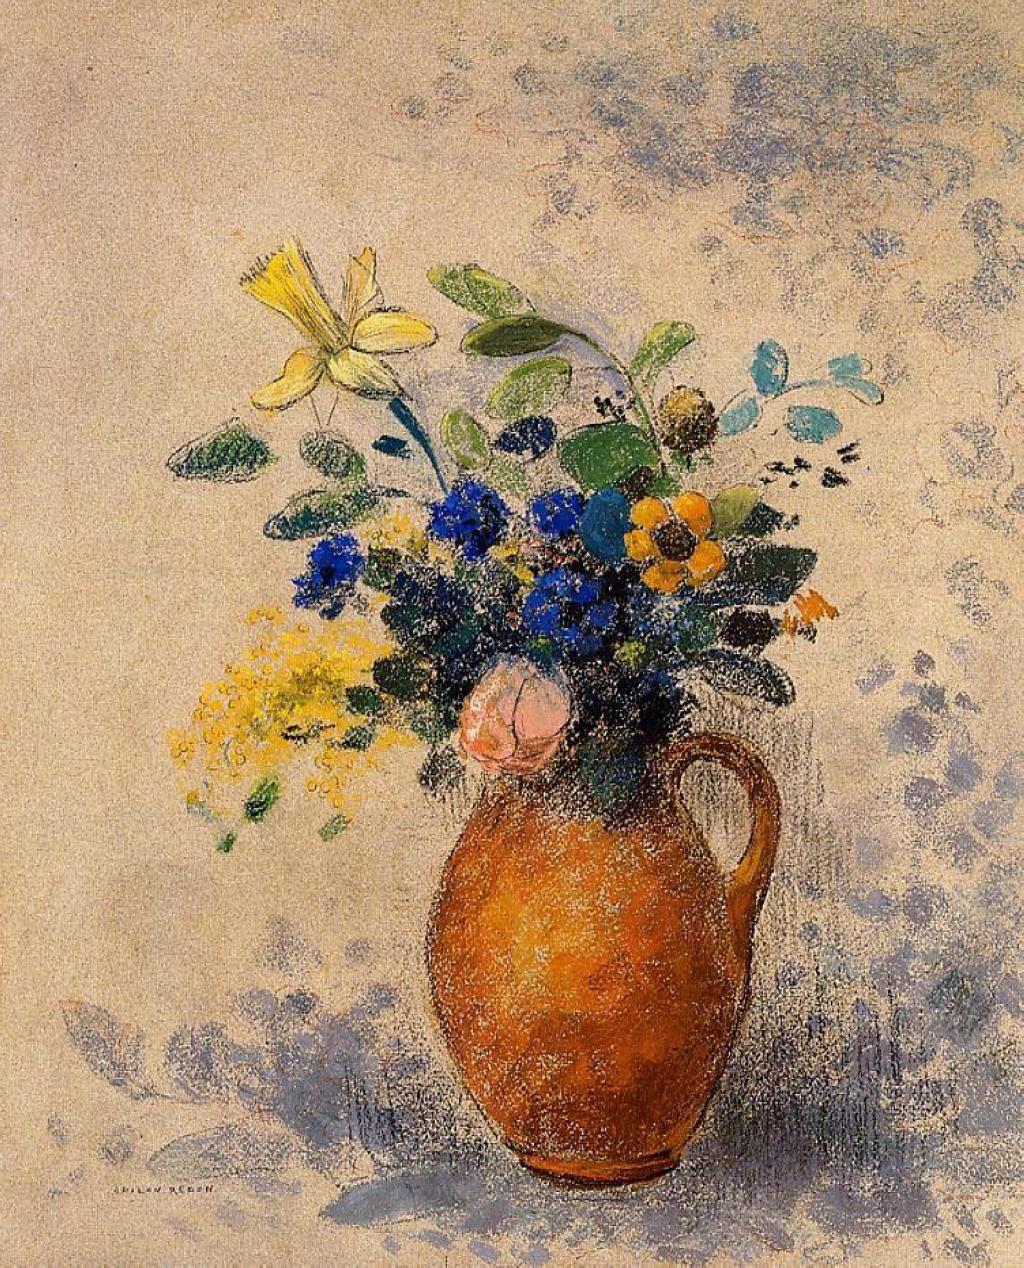 vase of flowers odilon redon encyclopedia of visual arts. Black Bedroom Furniture Sets. Home Design Ideas